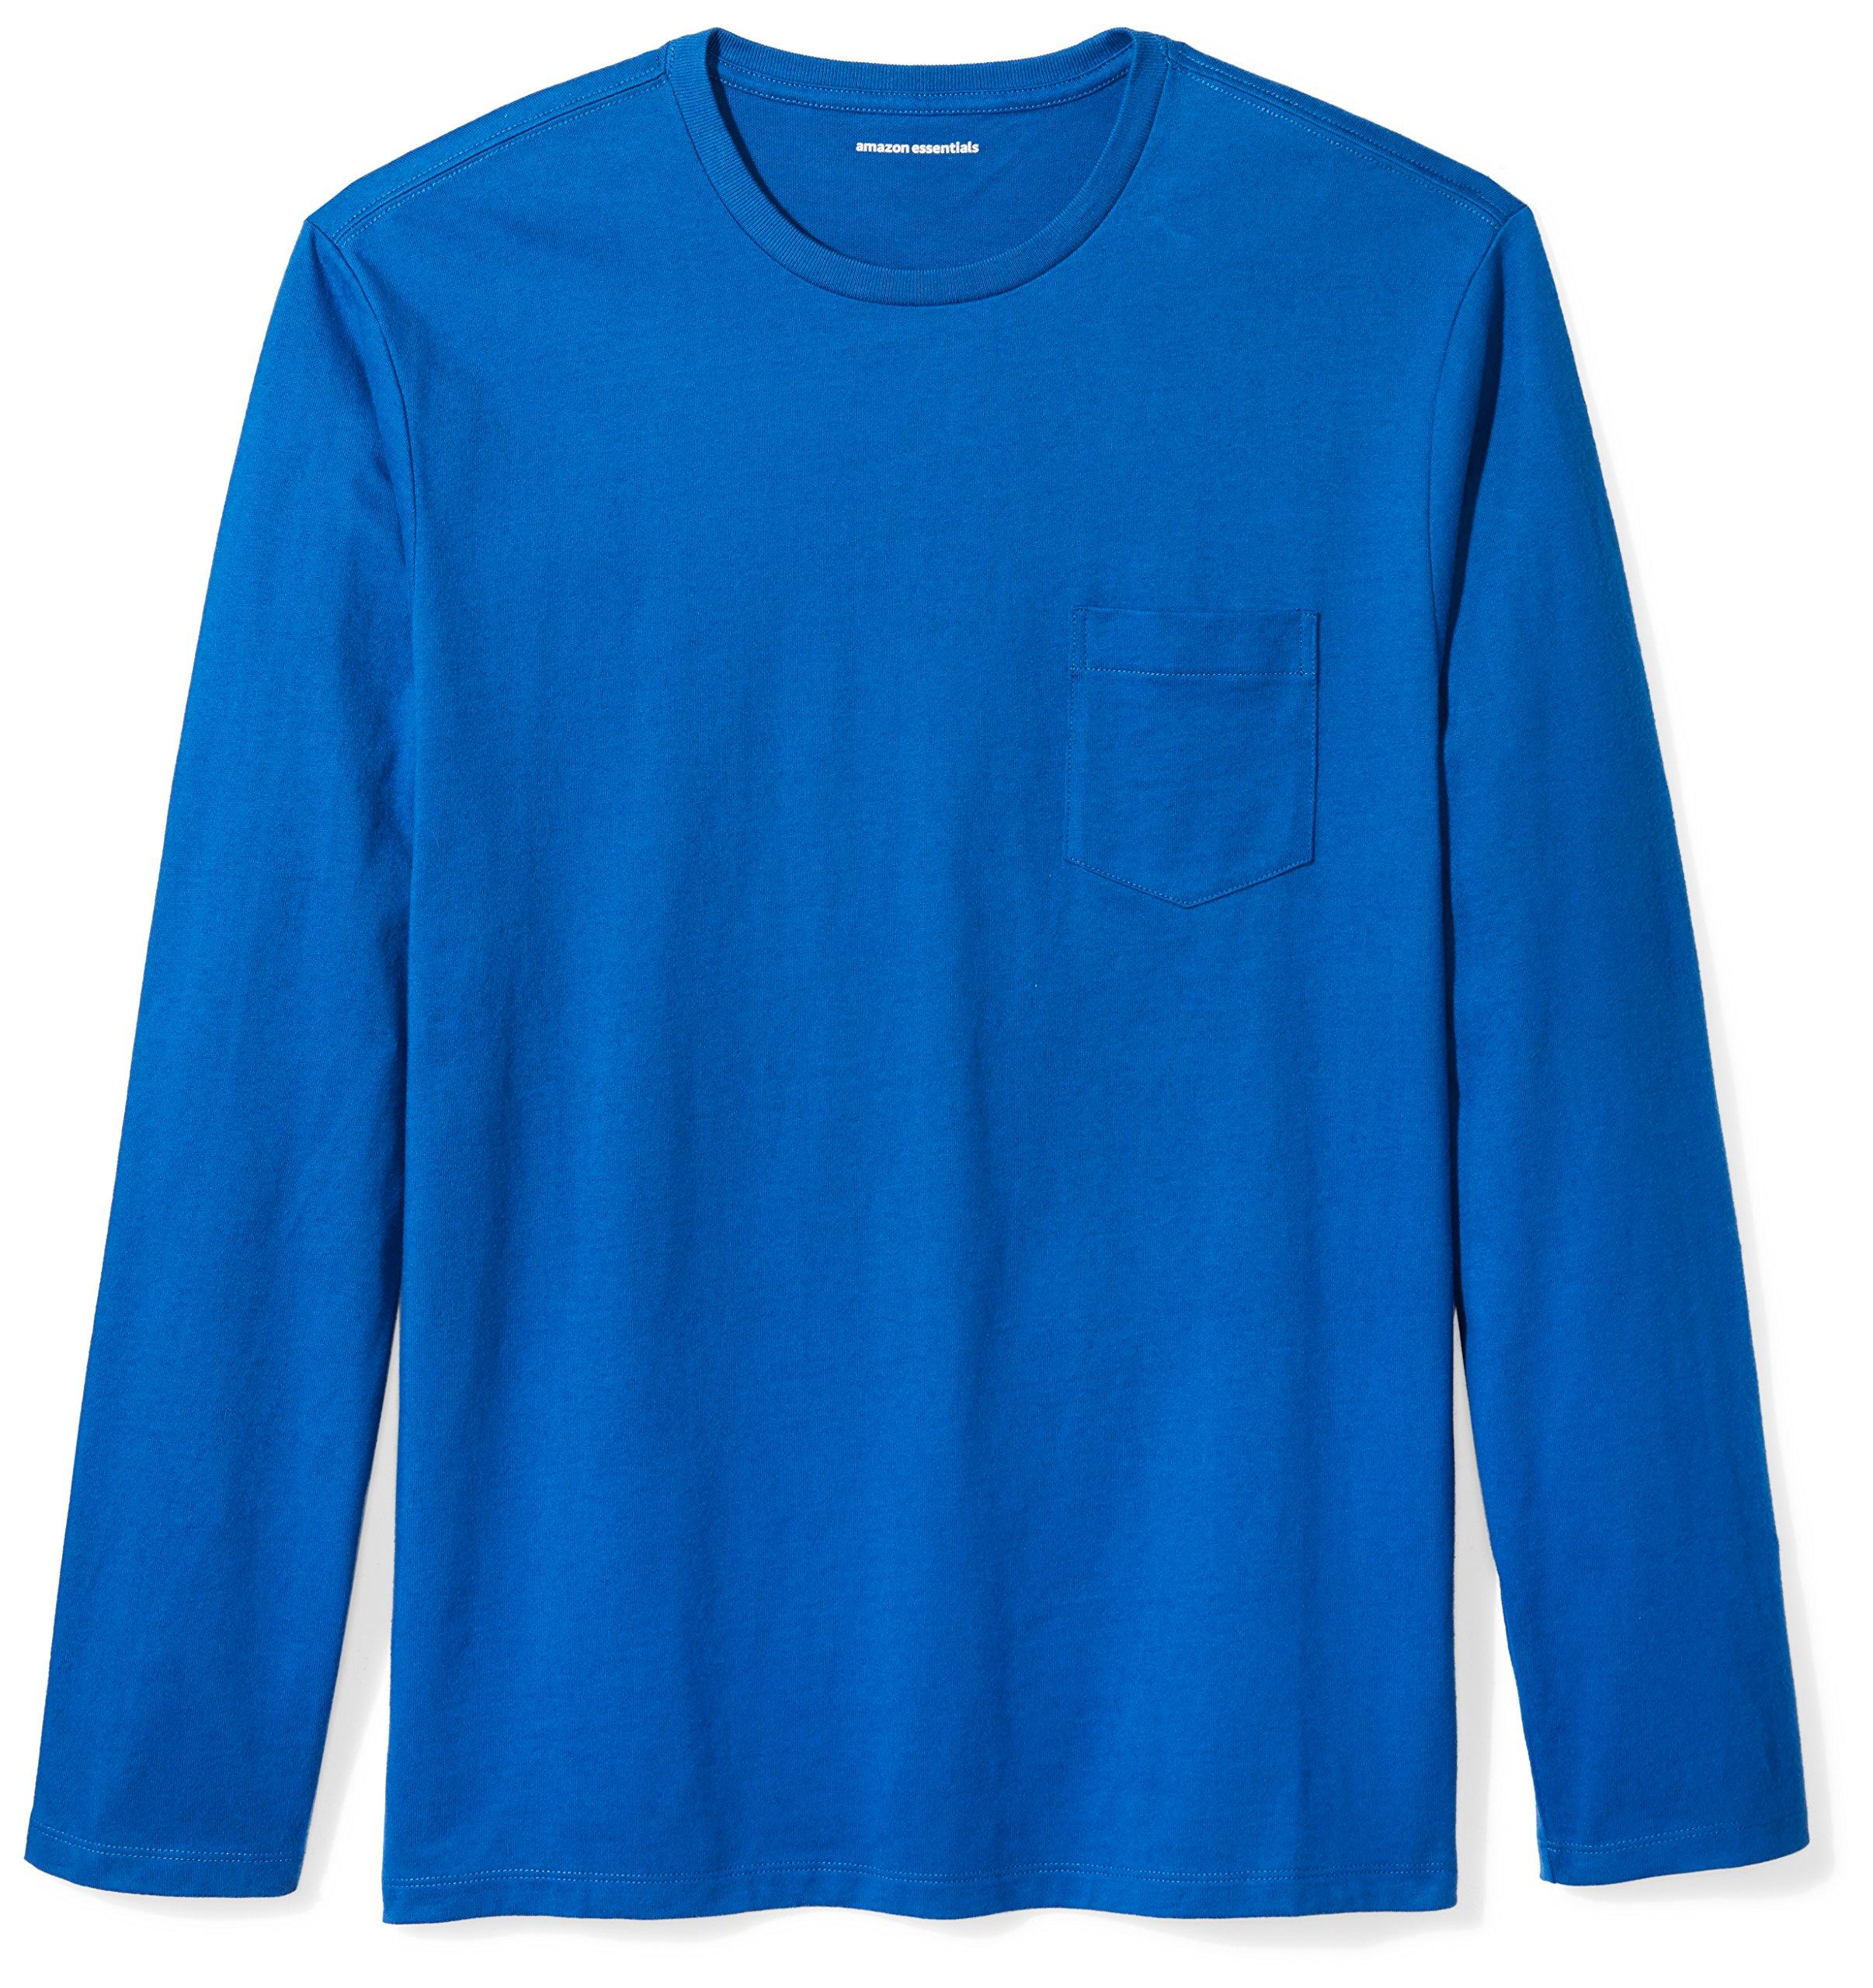 Amazon Essentials Men's Regular-Fit Long-Sleeve Pocket T-Shirt, Bright Blue, Medium